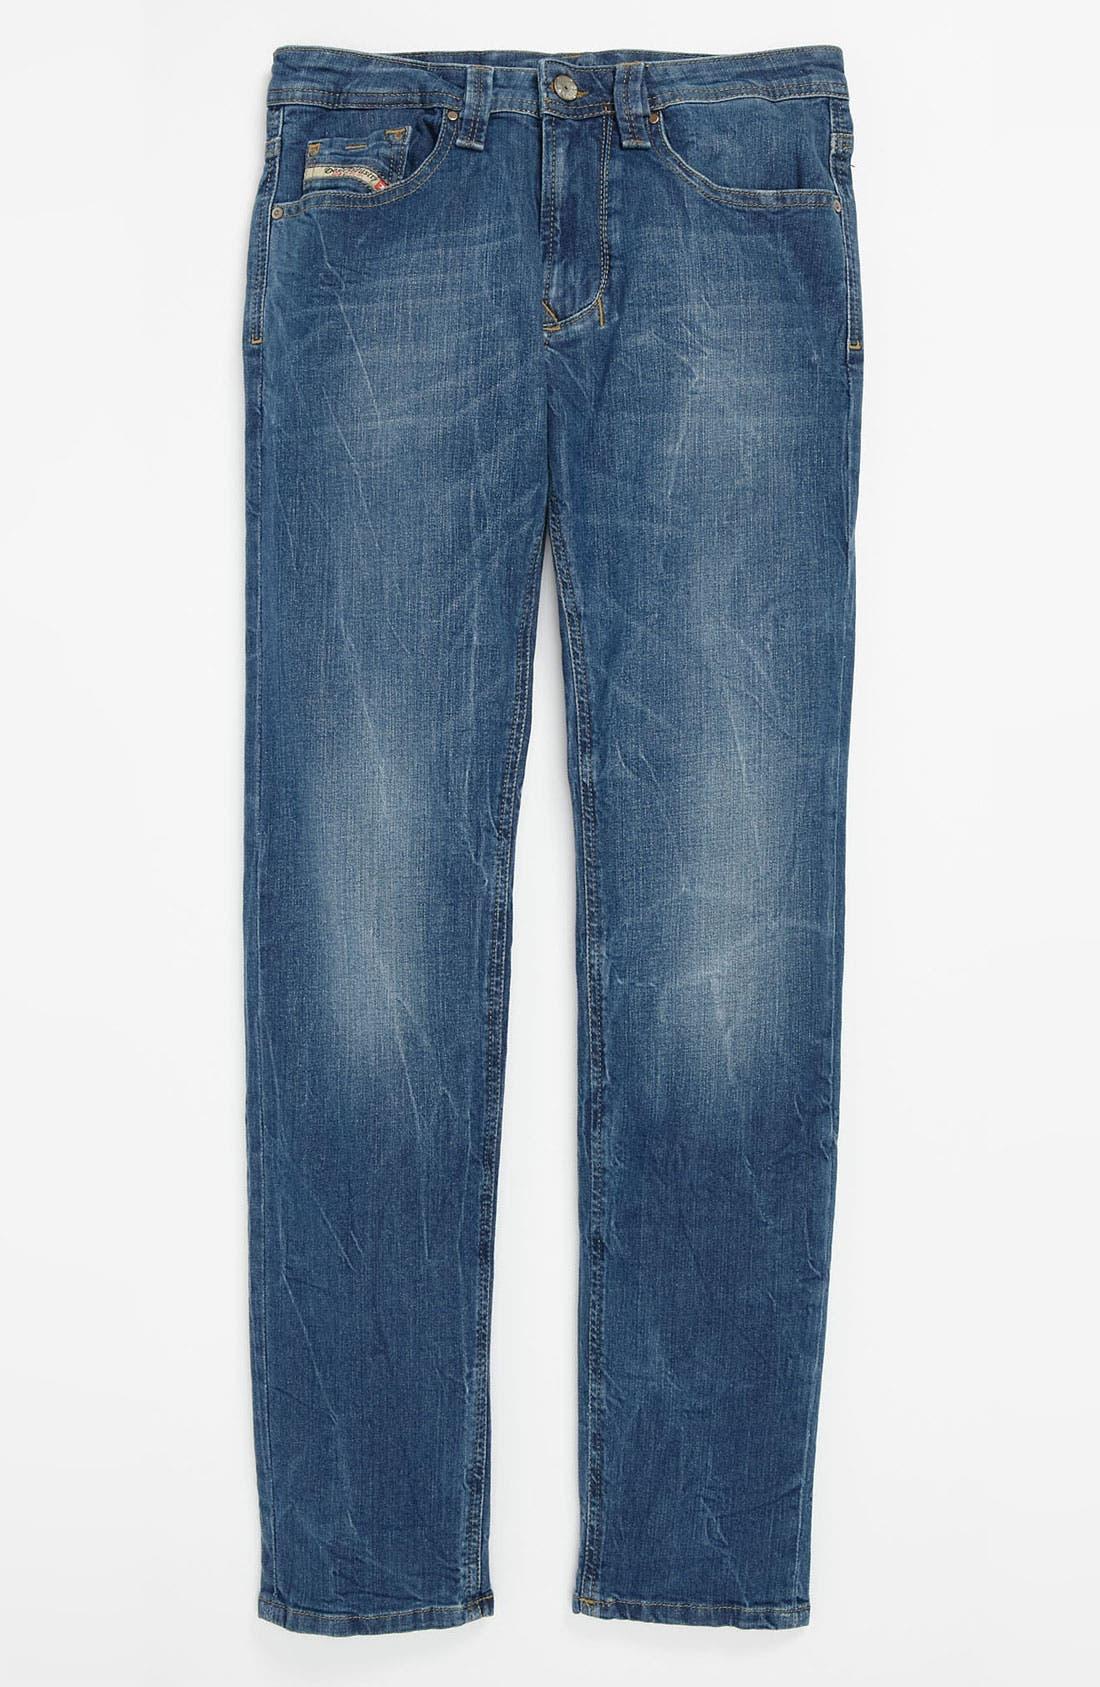 'Larkee' Jeans,                             Alternate thumbnail 2, color,